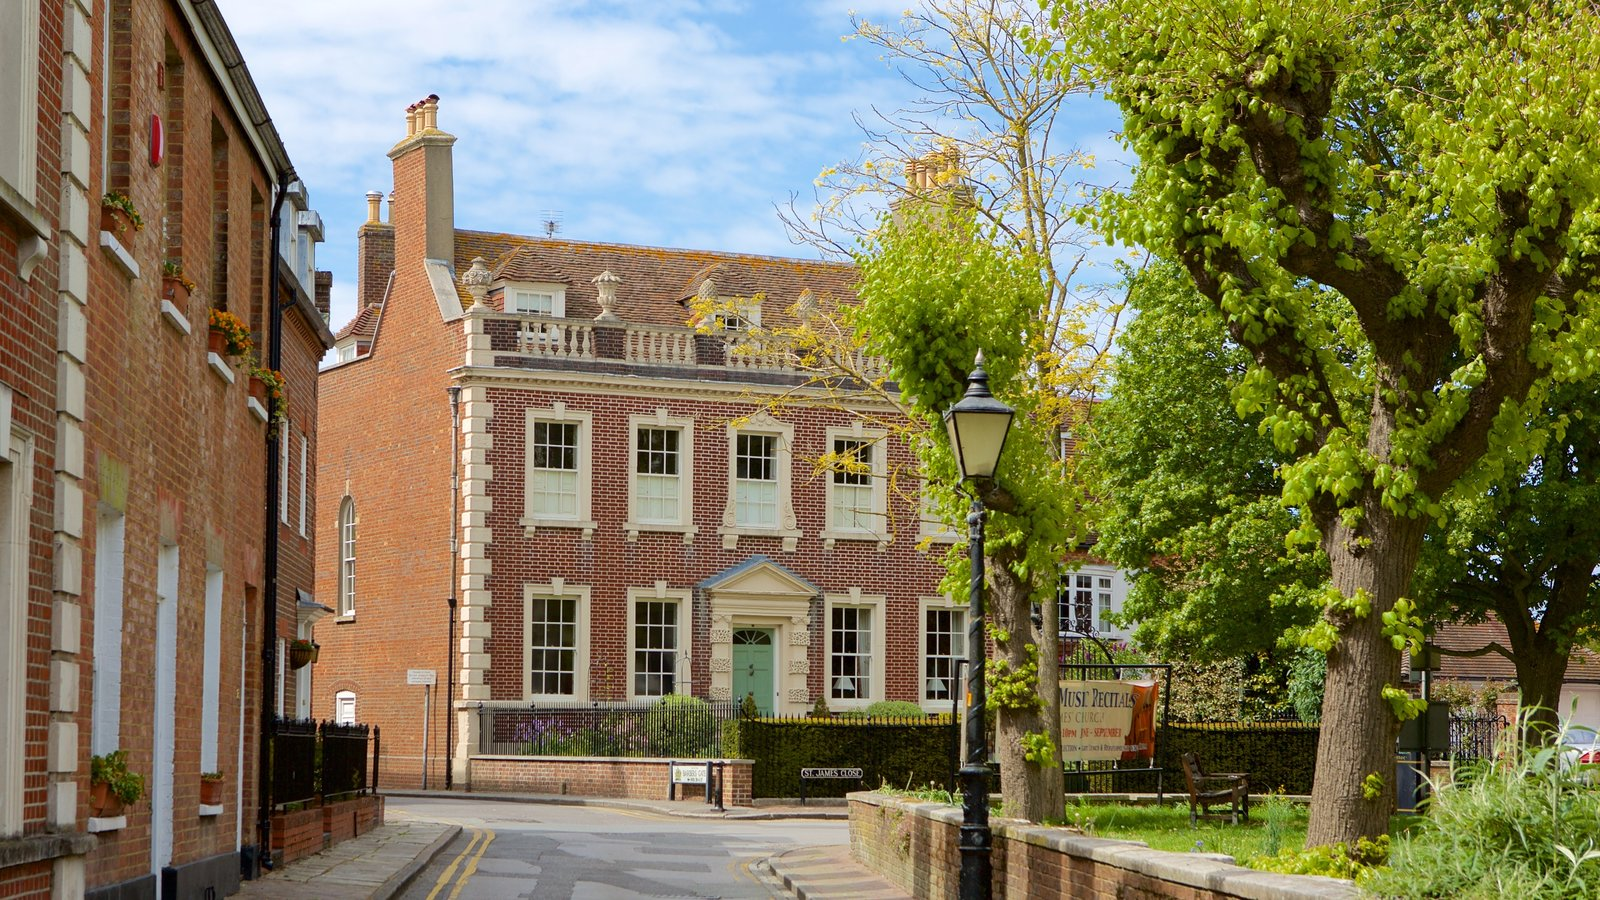 Poole que inclui arquitetura de patrimônio